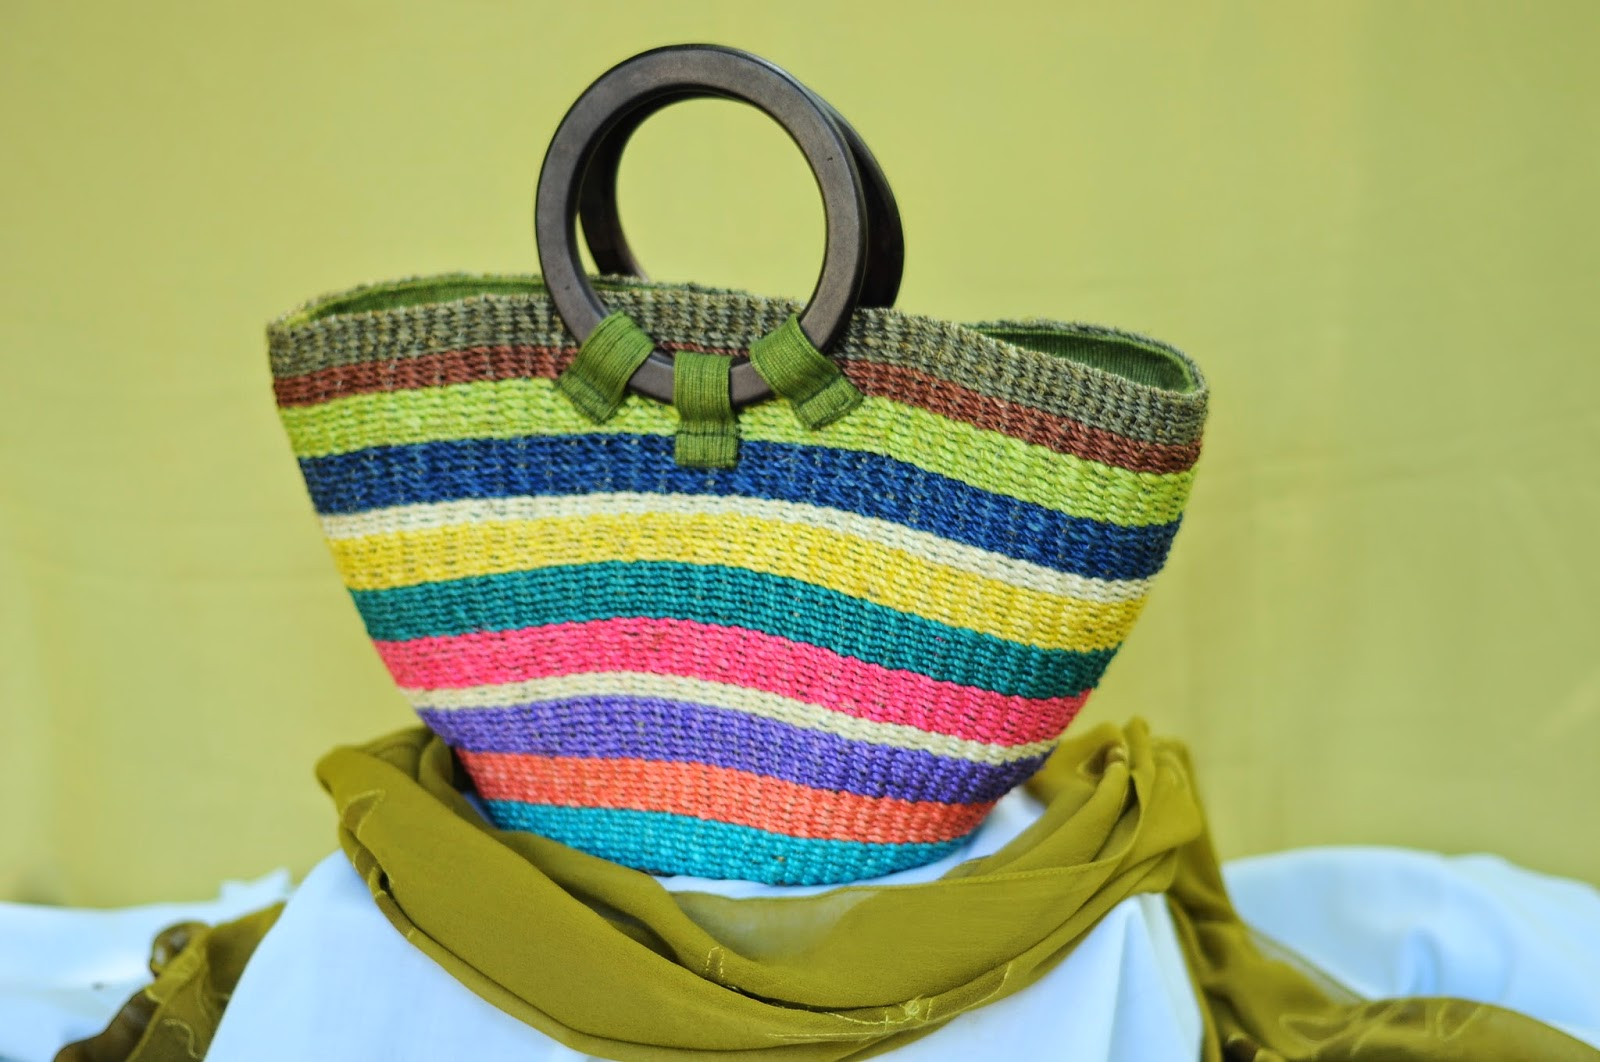 DTI CARP BIKOL Products: ABACA Fashion BAGS of Albay, Philippines